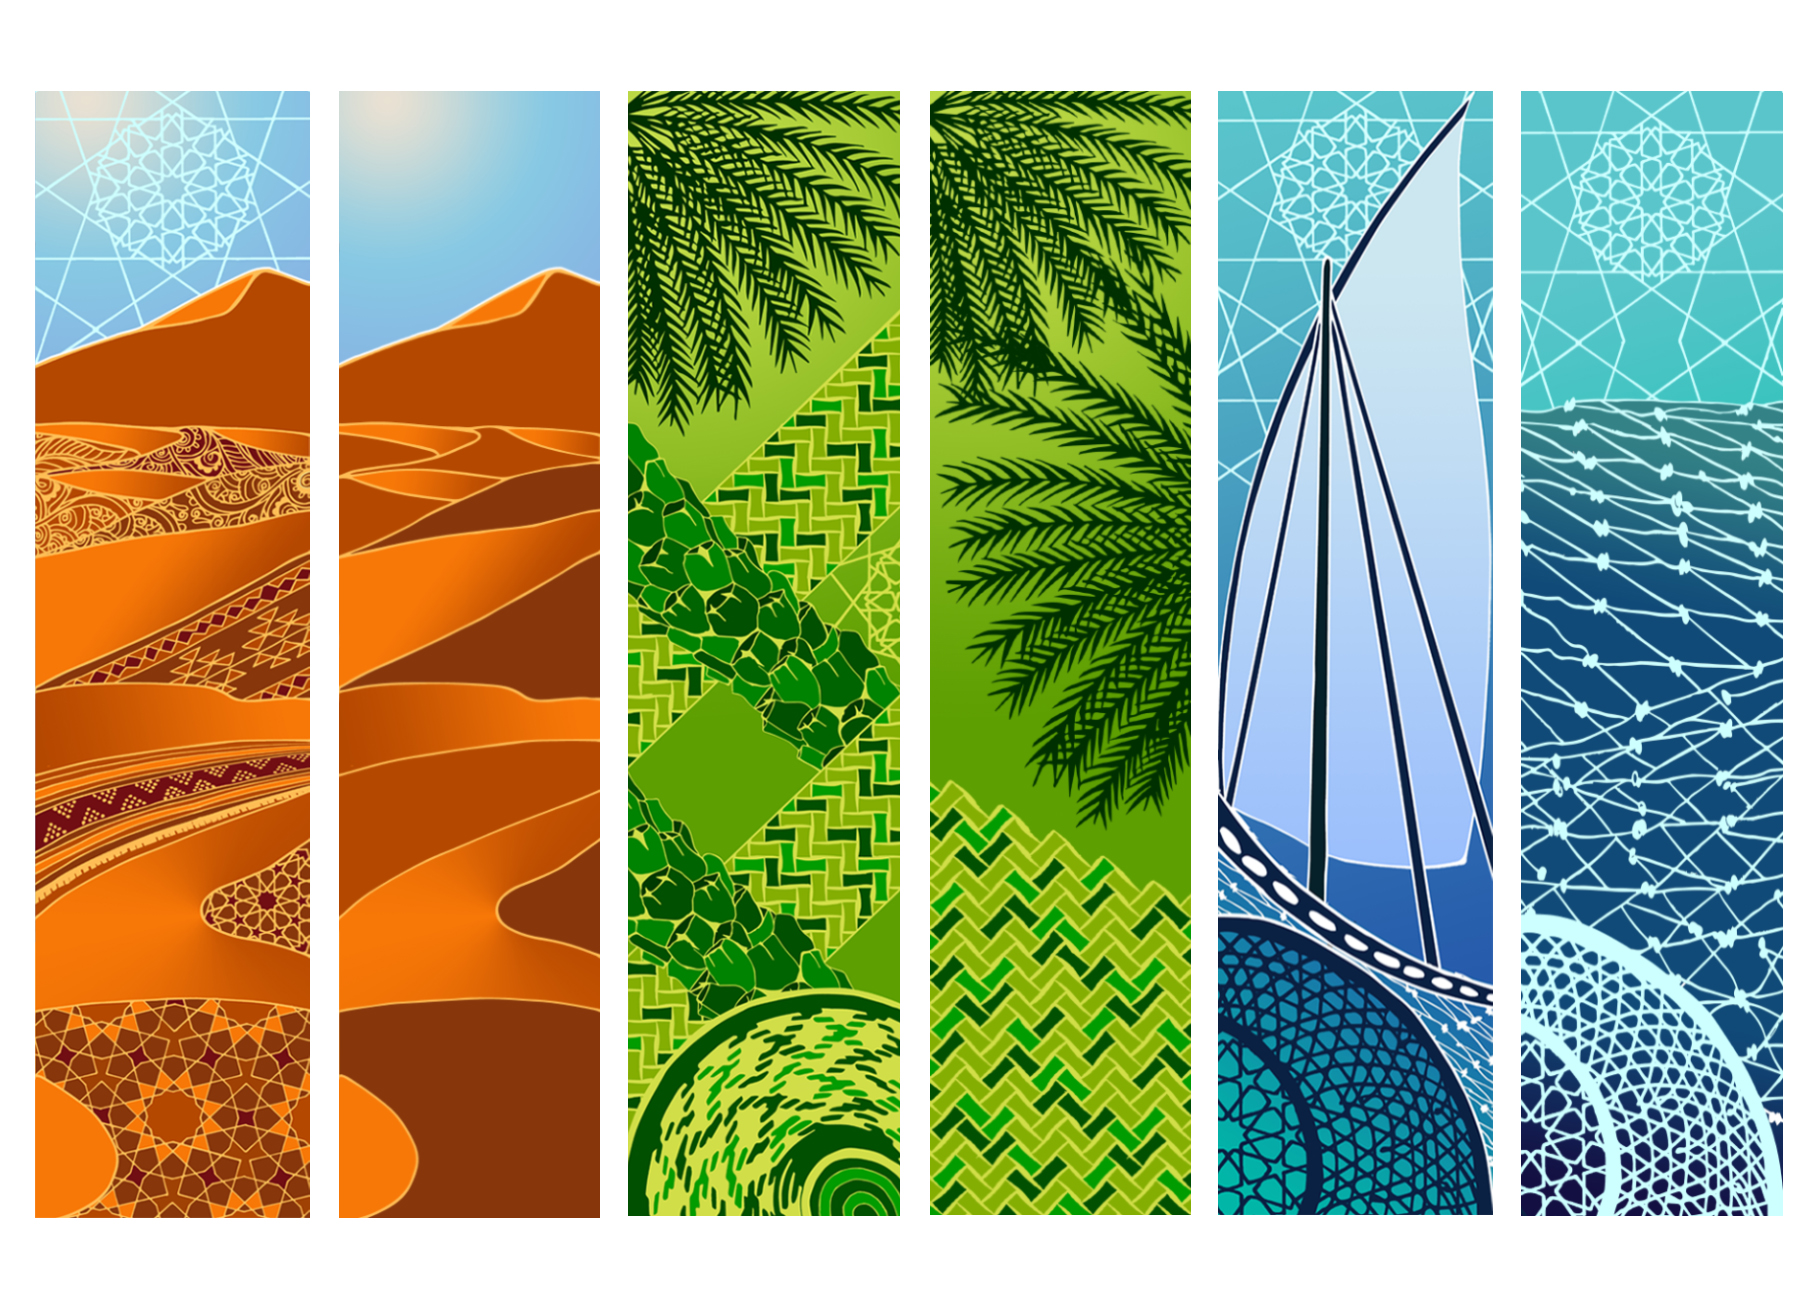 KinetikaMilan2015UAEDayExpo2020DubaiFlagDesigns.jpg